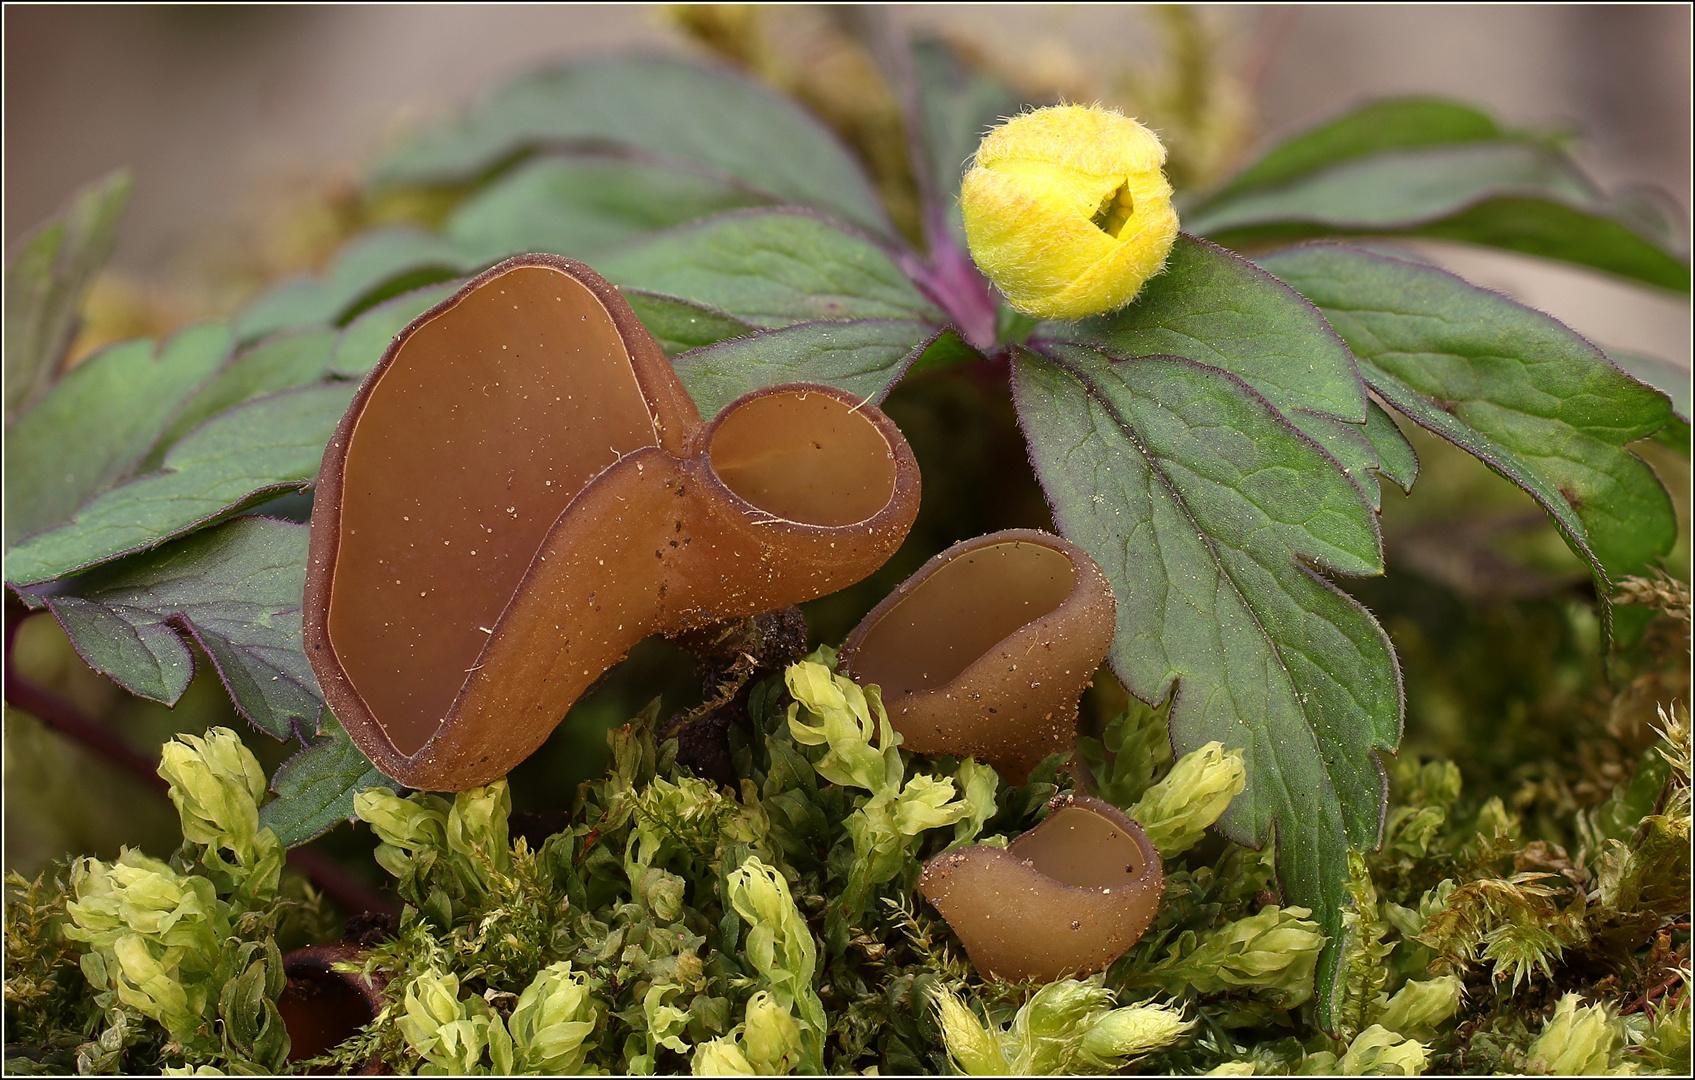 Anemonenbecherling (Dumontinia tuberosa)